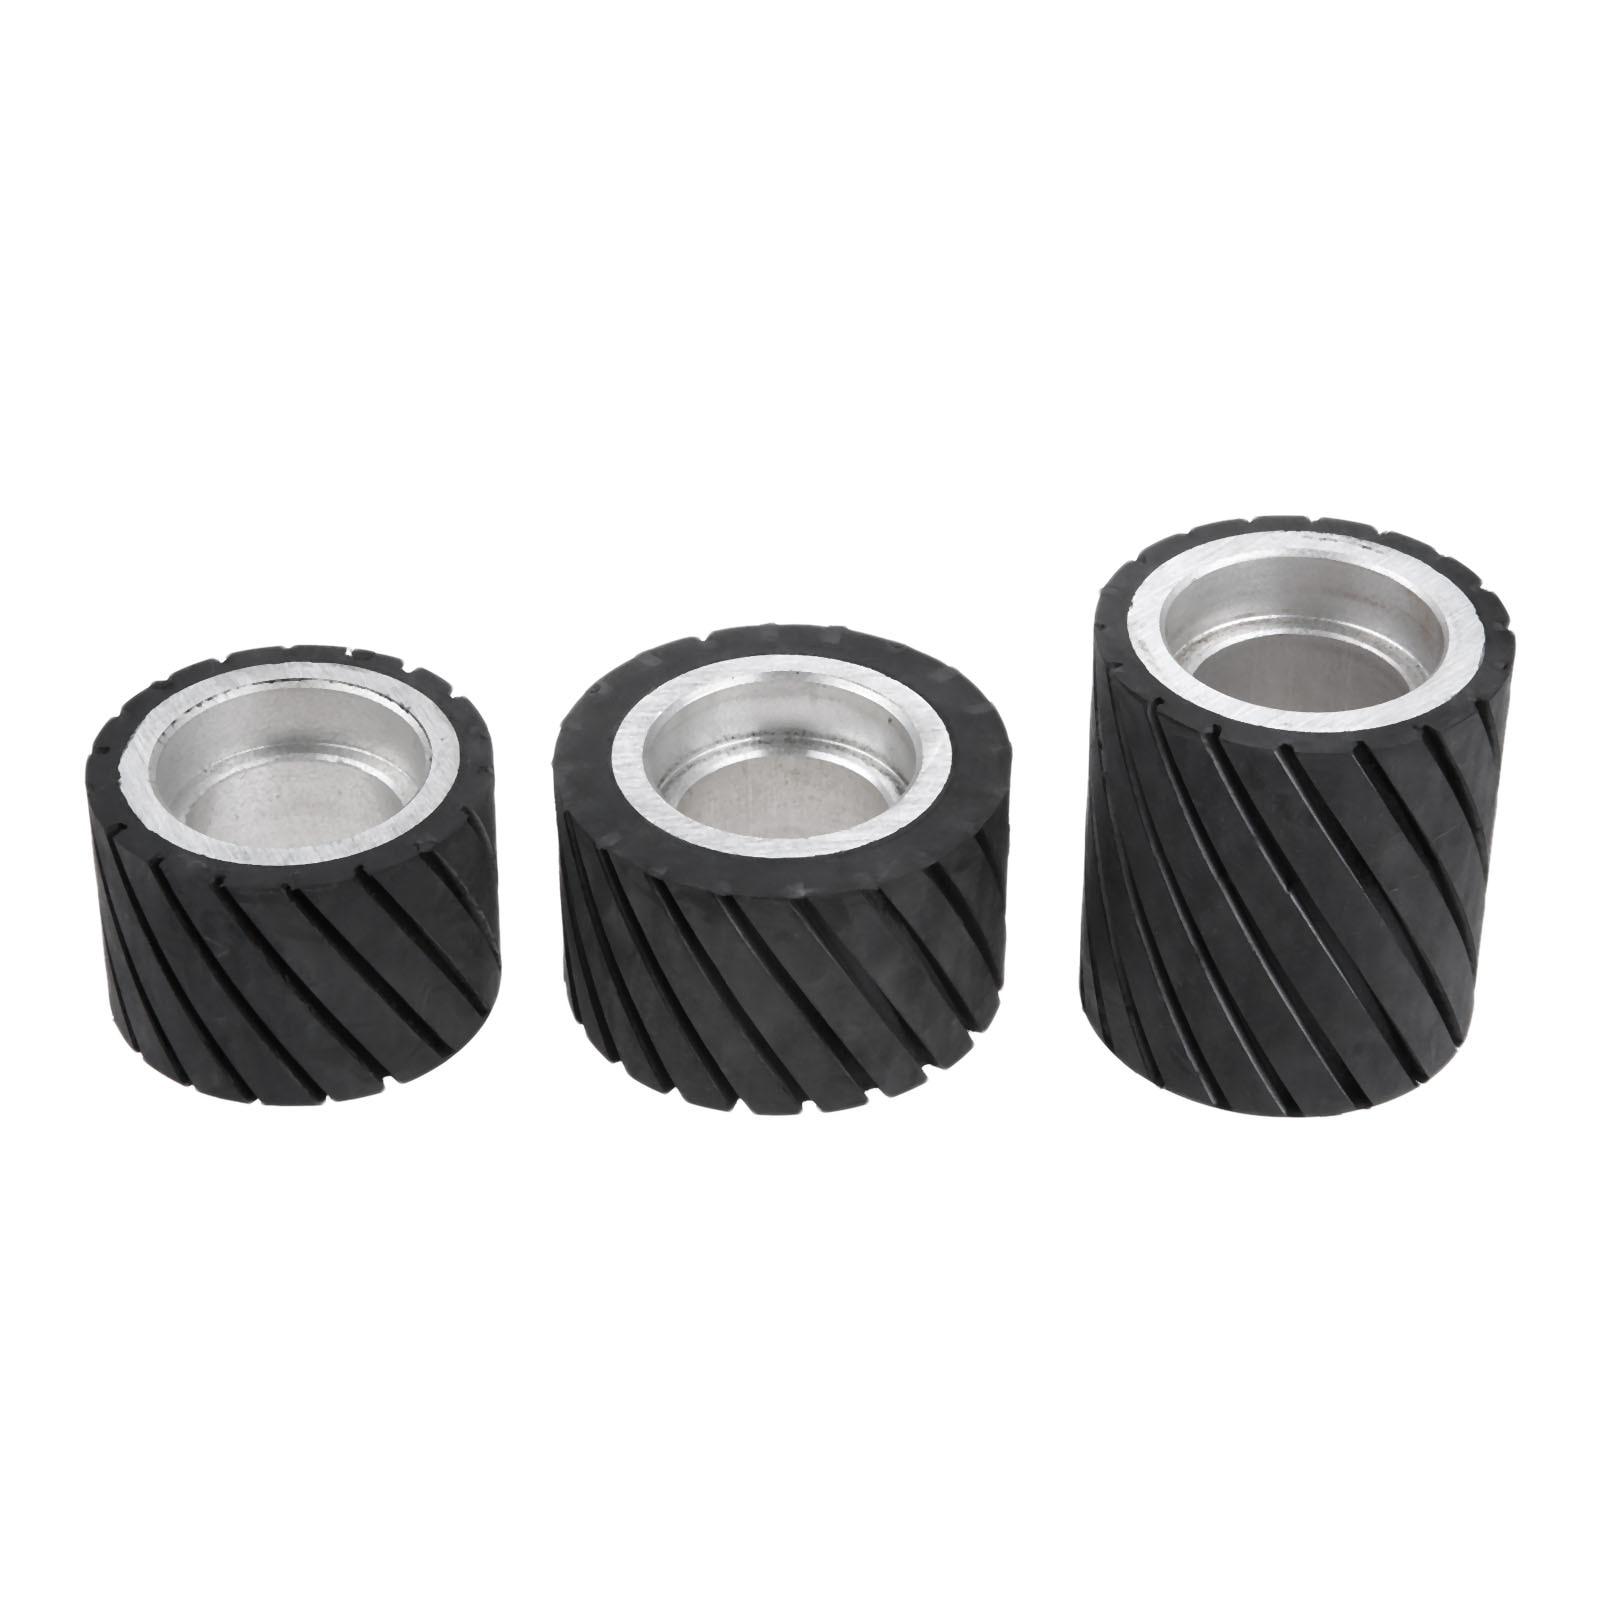 🛒 150*50mm Diagonal Rubber Contact wheel Belt Grinder Wheel